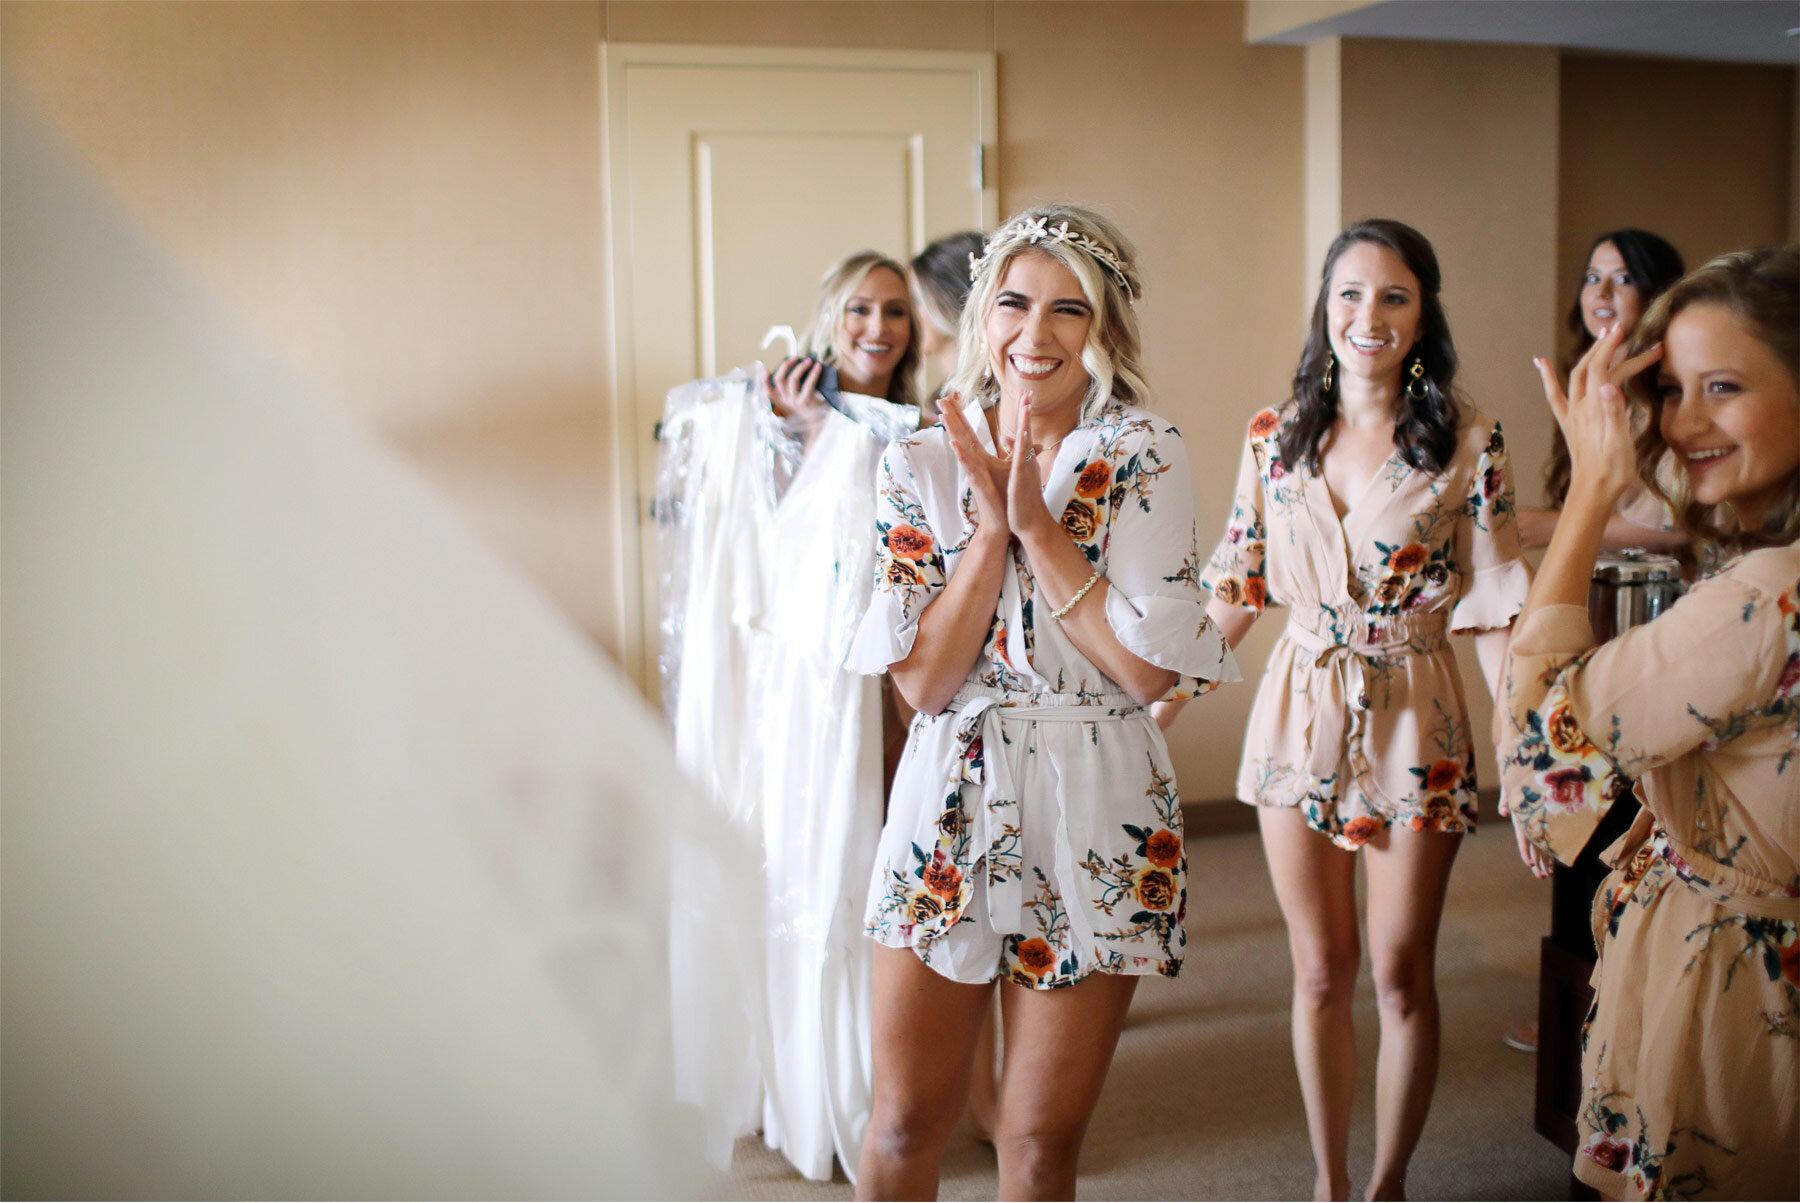 01-Vick-Photography-Wedding-Duluth-Minnesota-Glensheen-Mansion-Bride-Robes-Catherine-and-John.jpg